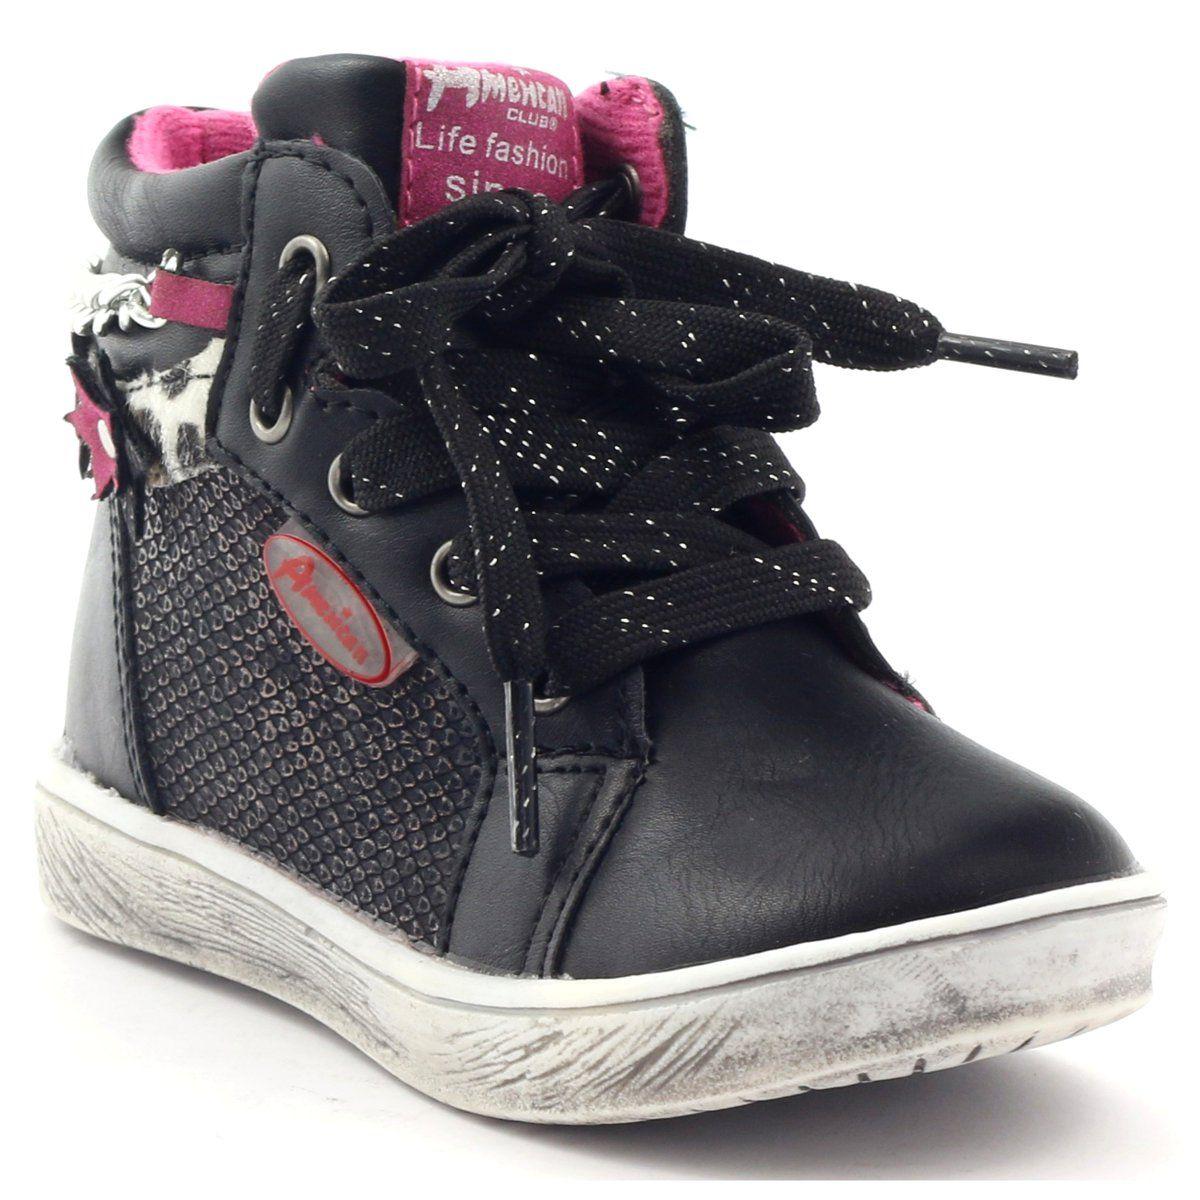 American Club Trzewiki Sportowe Suwak American 10108 Rozowe Szare Czarne Wedge Sneaker Shoes Sneakers